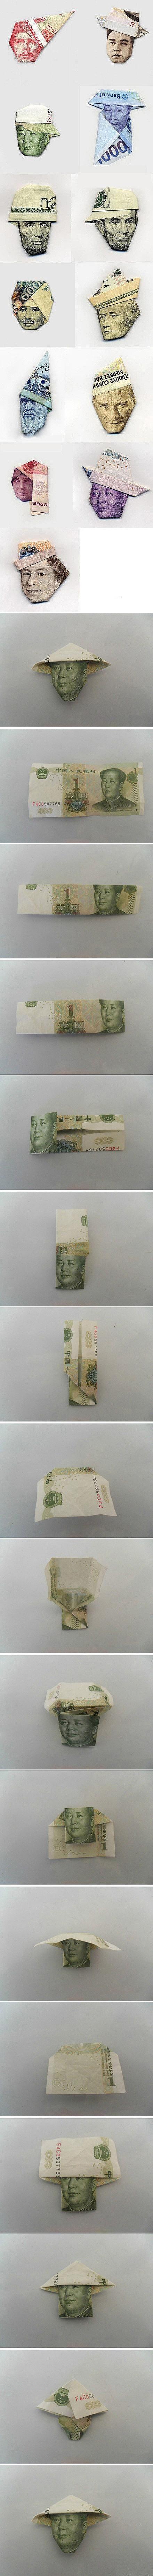 Banknote money origami cap